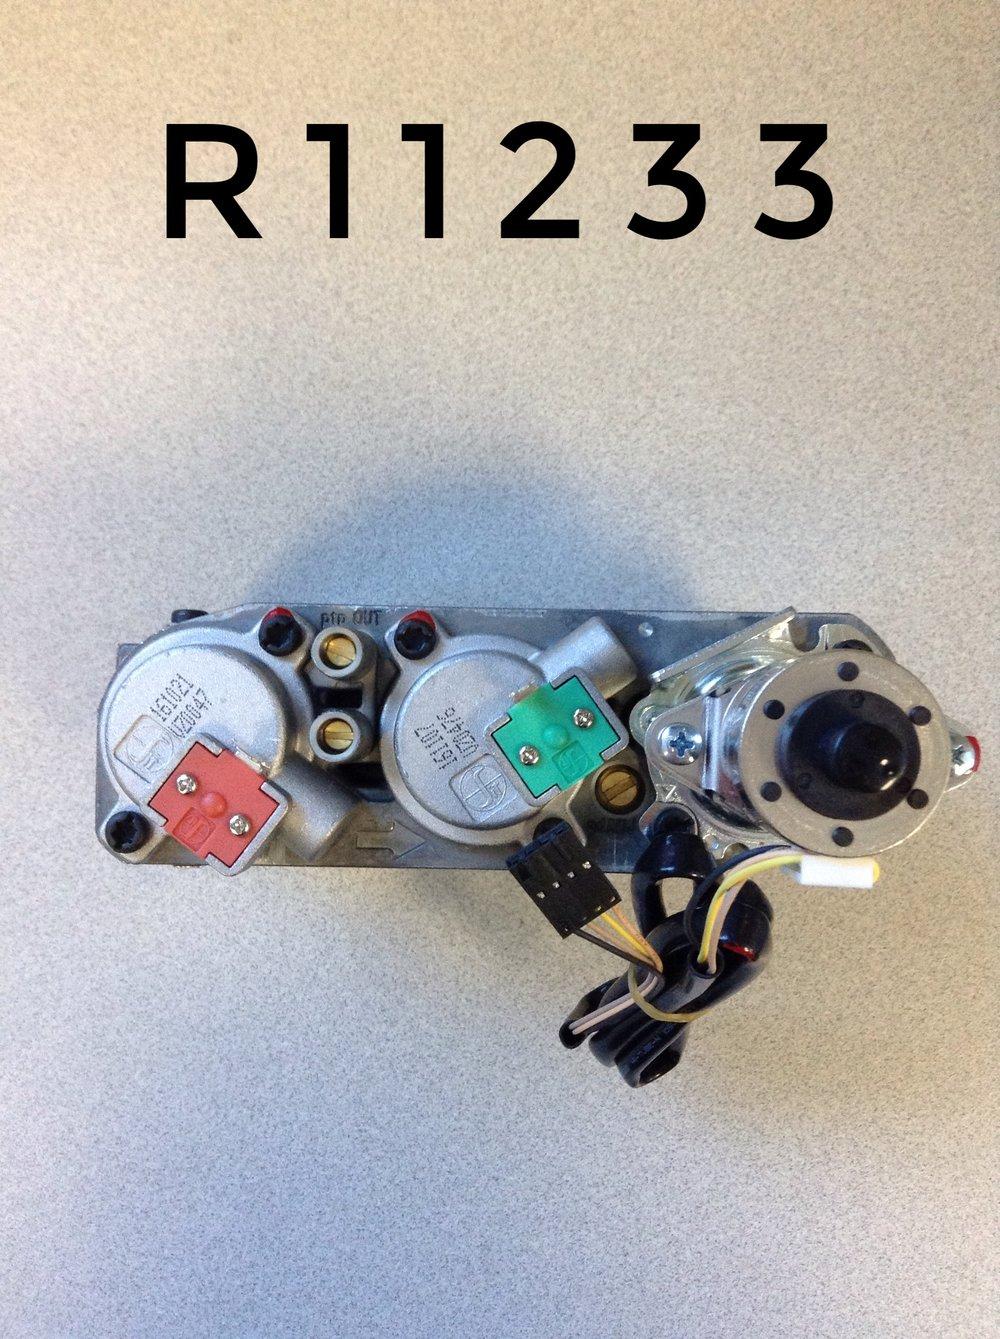 R11233 (1).JPG